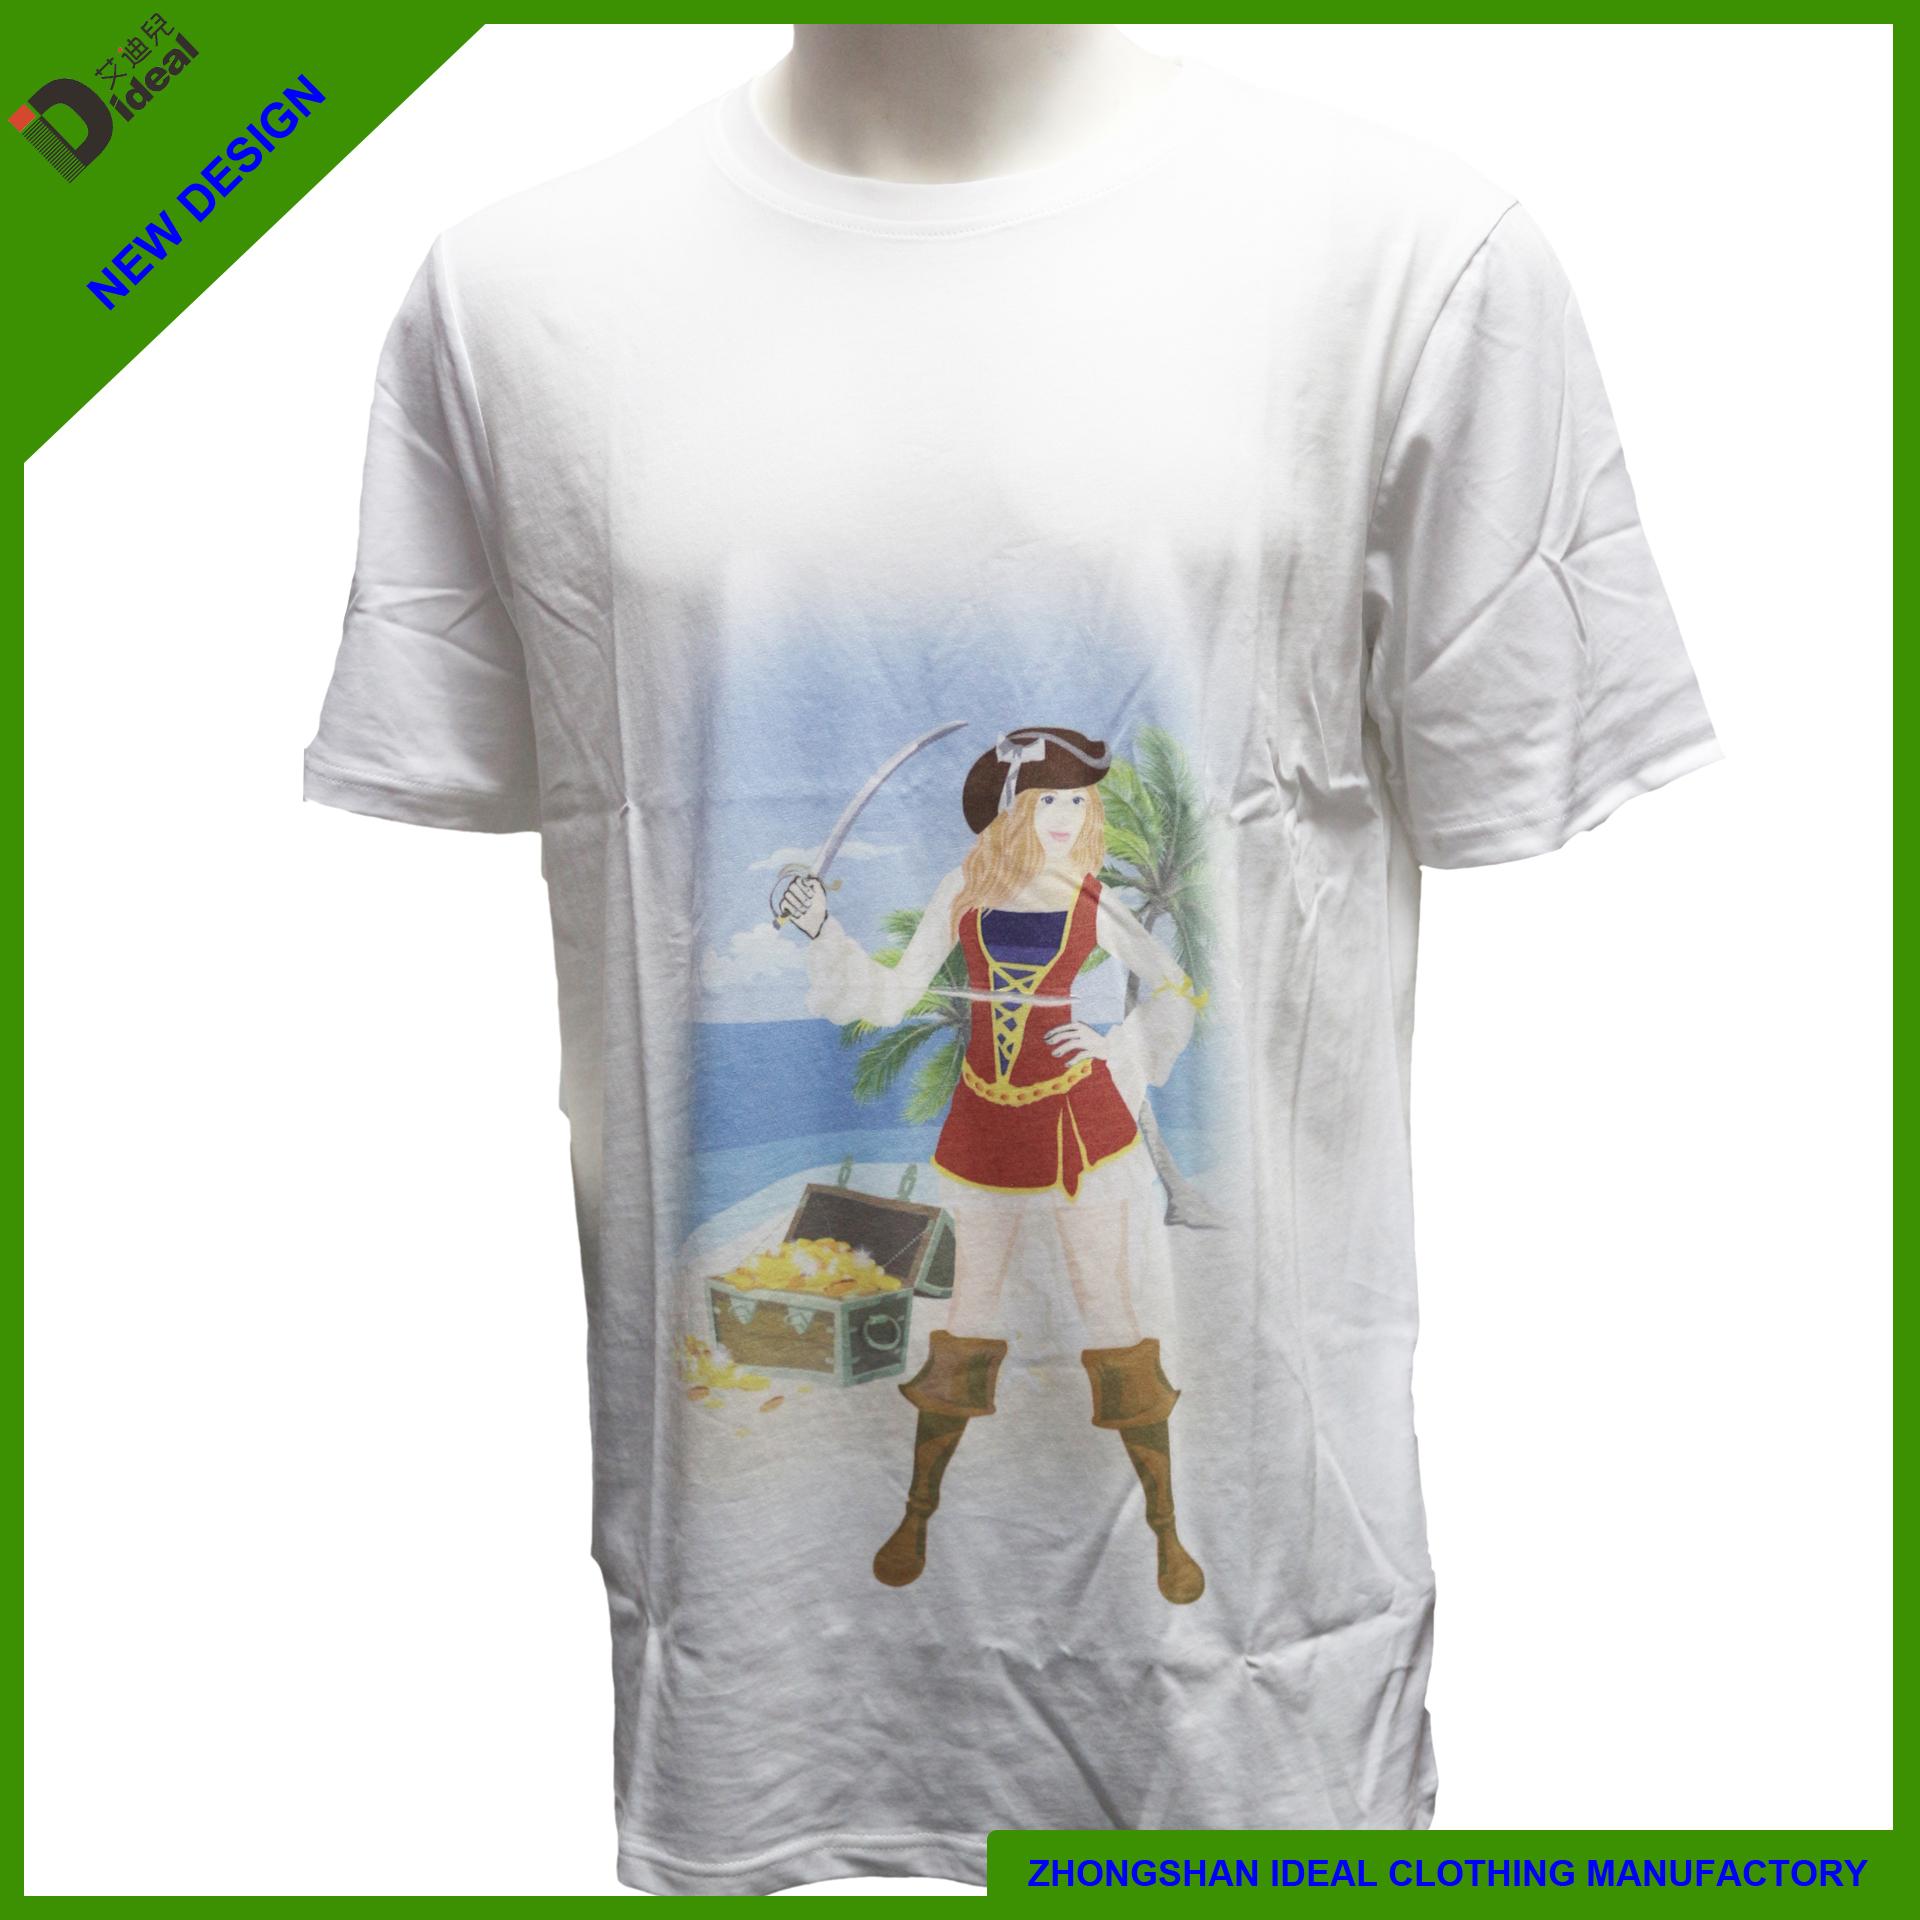 High quality Cotton Short Sleeve Mens T-shirt Quotes,China Cotton Short Sleeve Mens T-shirt Factory,Cotton Short Sleeve Mens T-shirt Purchasing